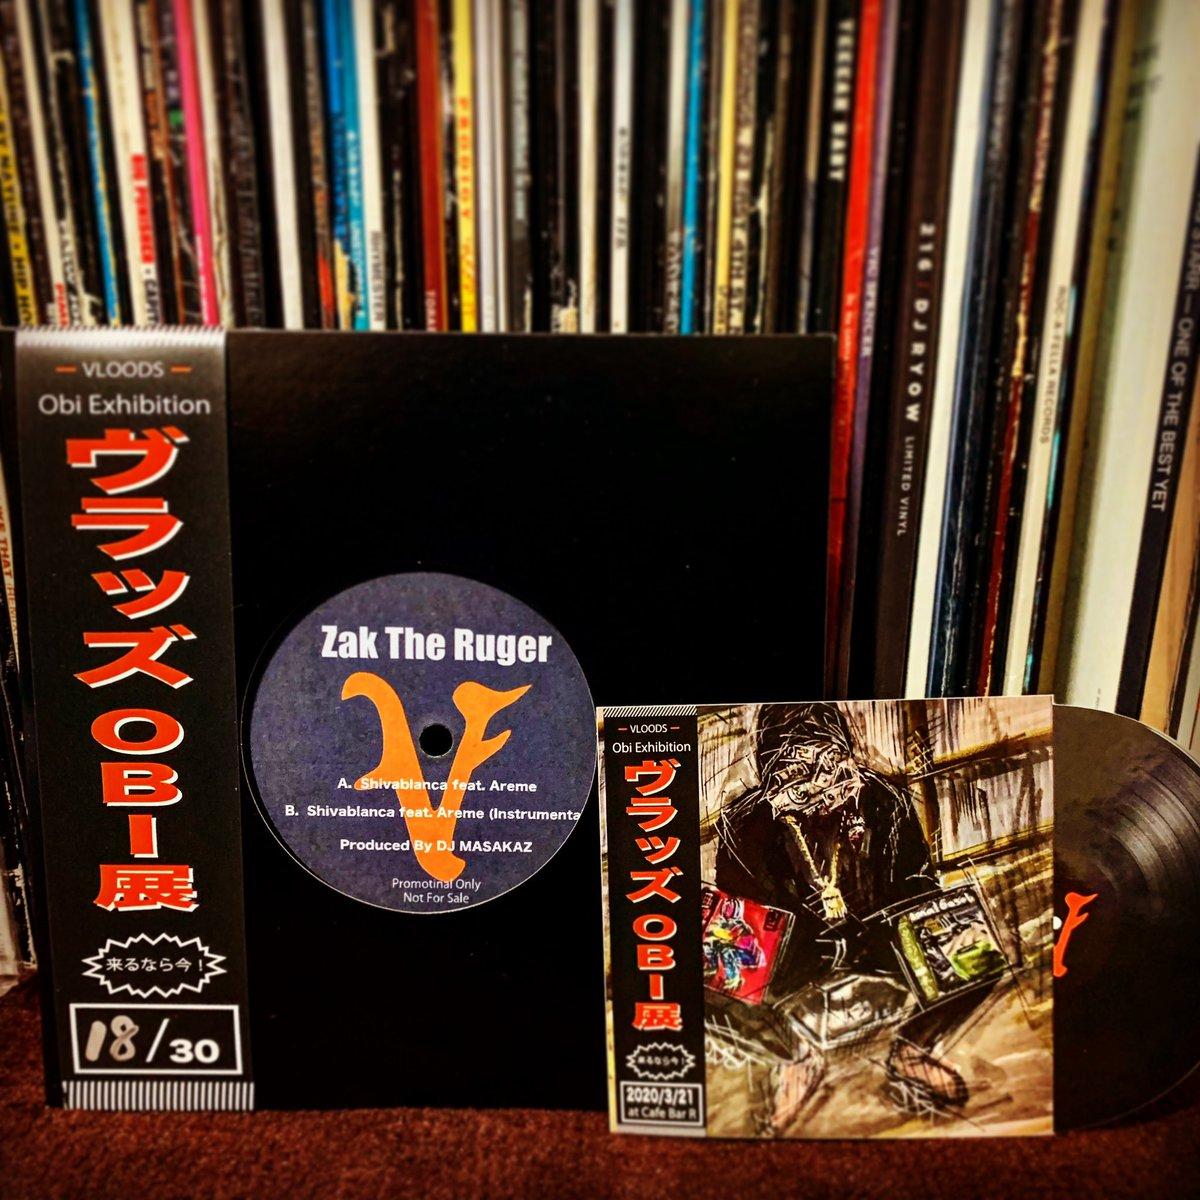 VLOODS OBI EXHIBITION ヴラッズ OBI展  Shivablanca  Zak The Ruger feat.Areme Produced By DJ MASAKAZ Limited Edition 18/30  #vloods #obiexhibition #ヴラッズ #obi展 #shivablanca #zaktheruger #areme #djmasakaz #hiphop #hiphopvinyl #vinylcollection #vinyljunkie #vinylcollector #obi https://t.co/CjnjJDNQgn